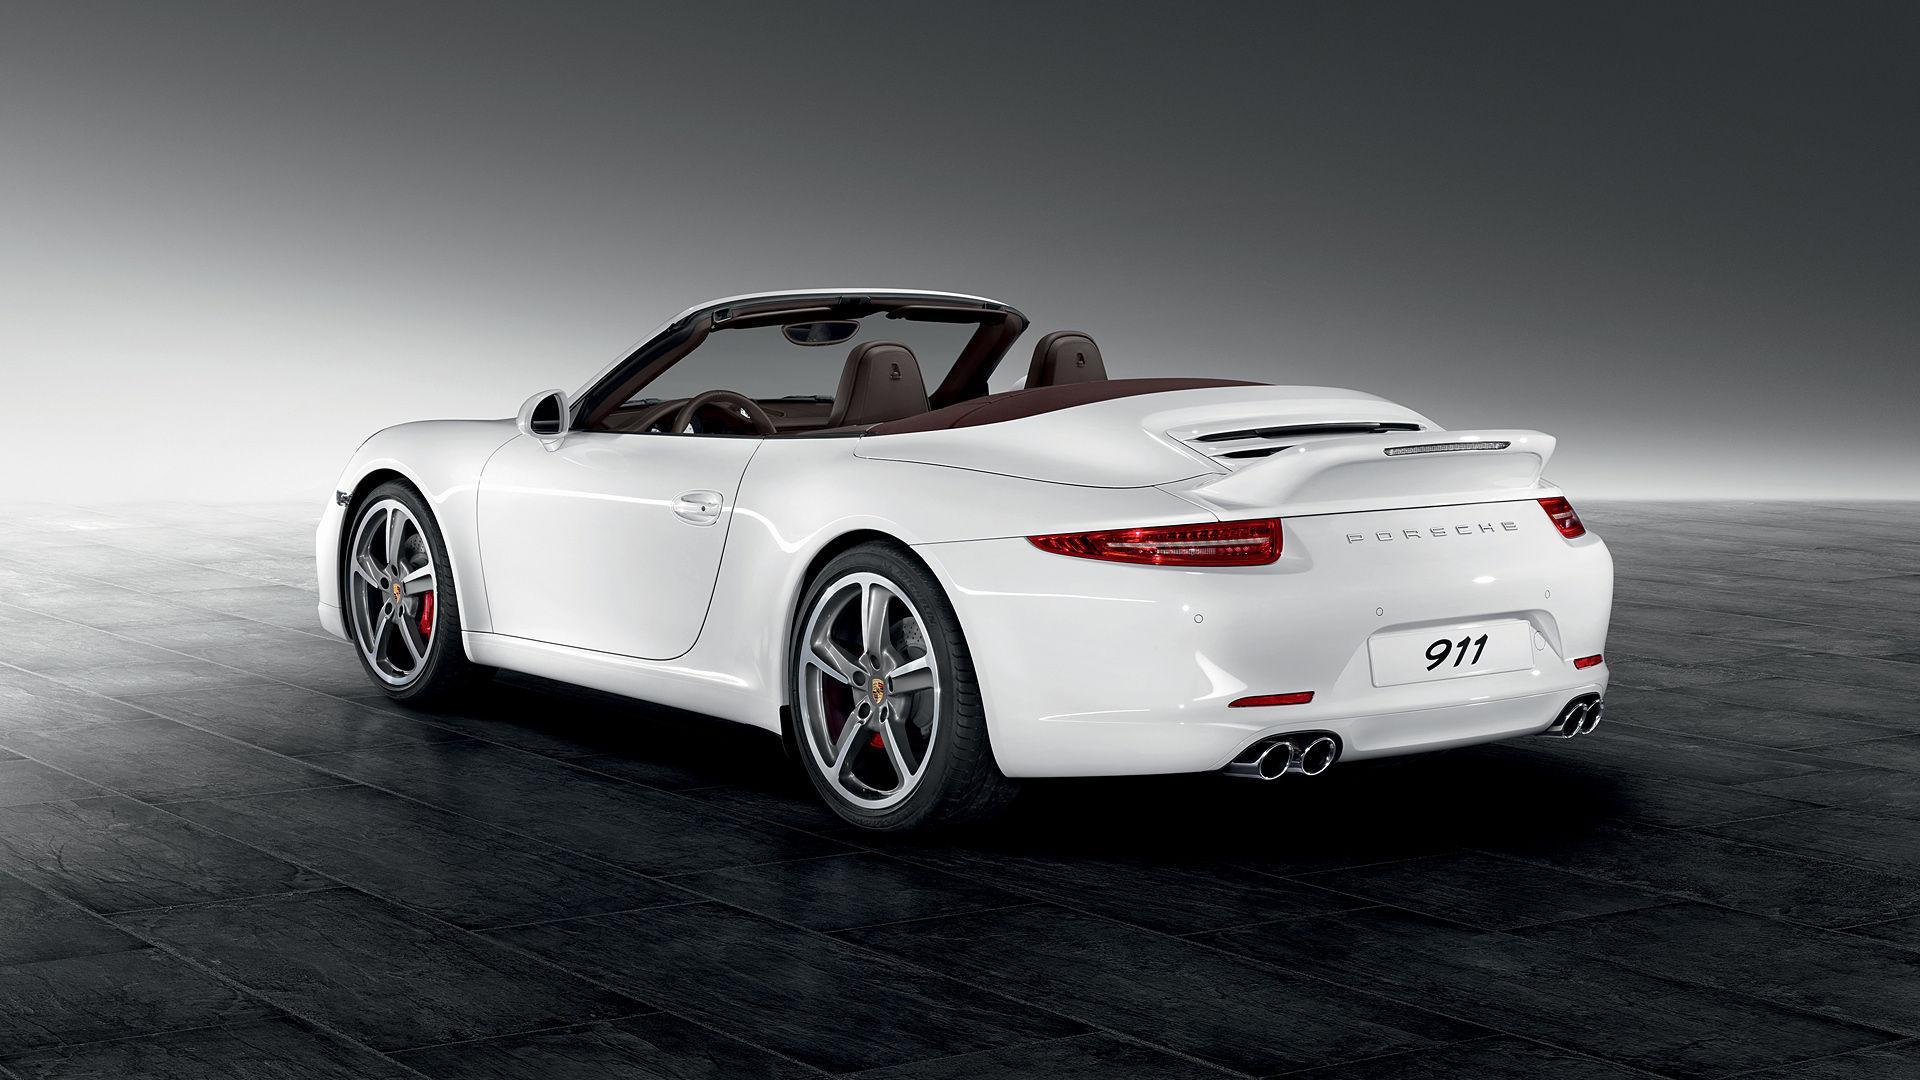 2012 Porsche 911 Carrera Aerokit Cup